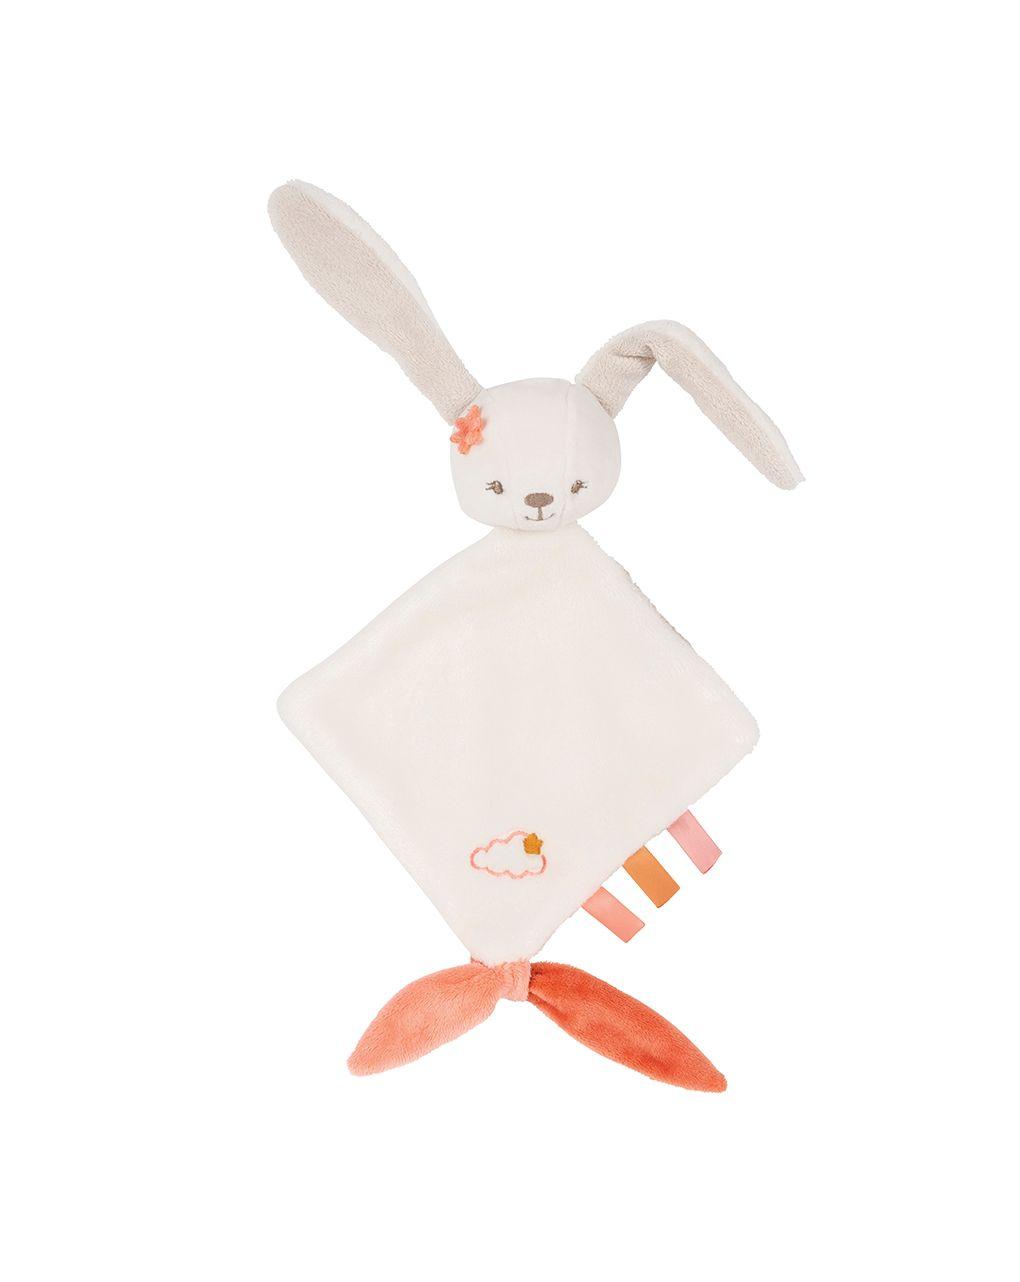 Nattou - mini doudou mia la coniglietta - Nattou